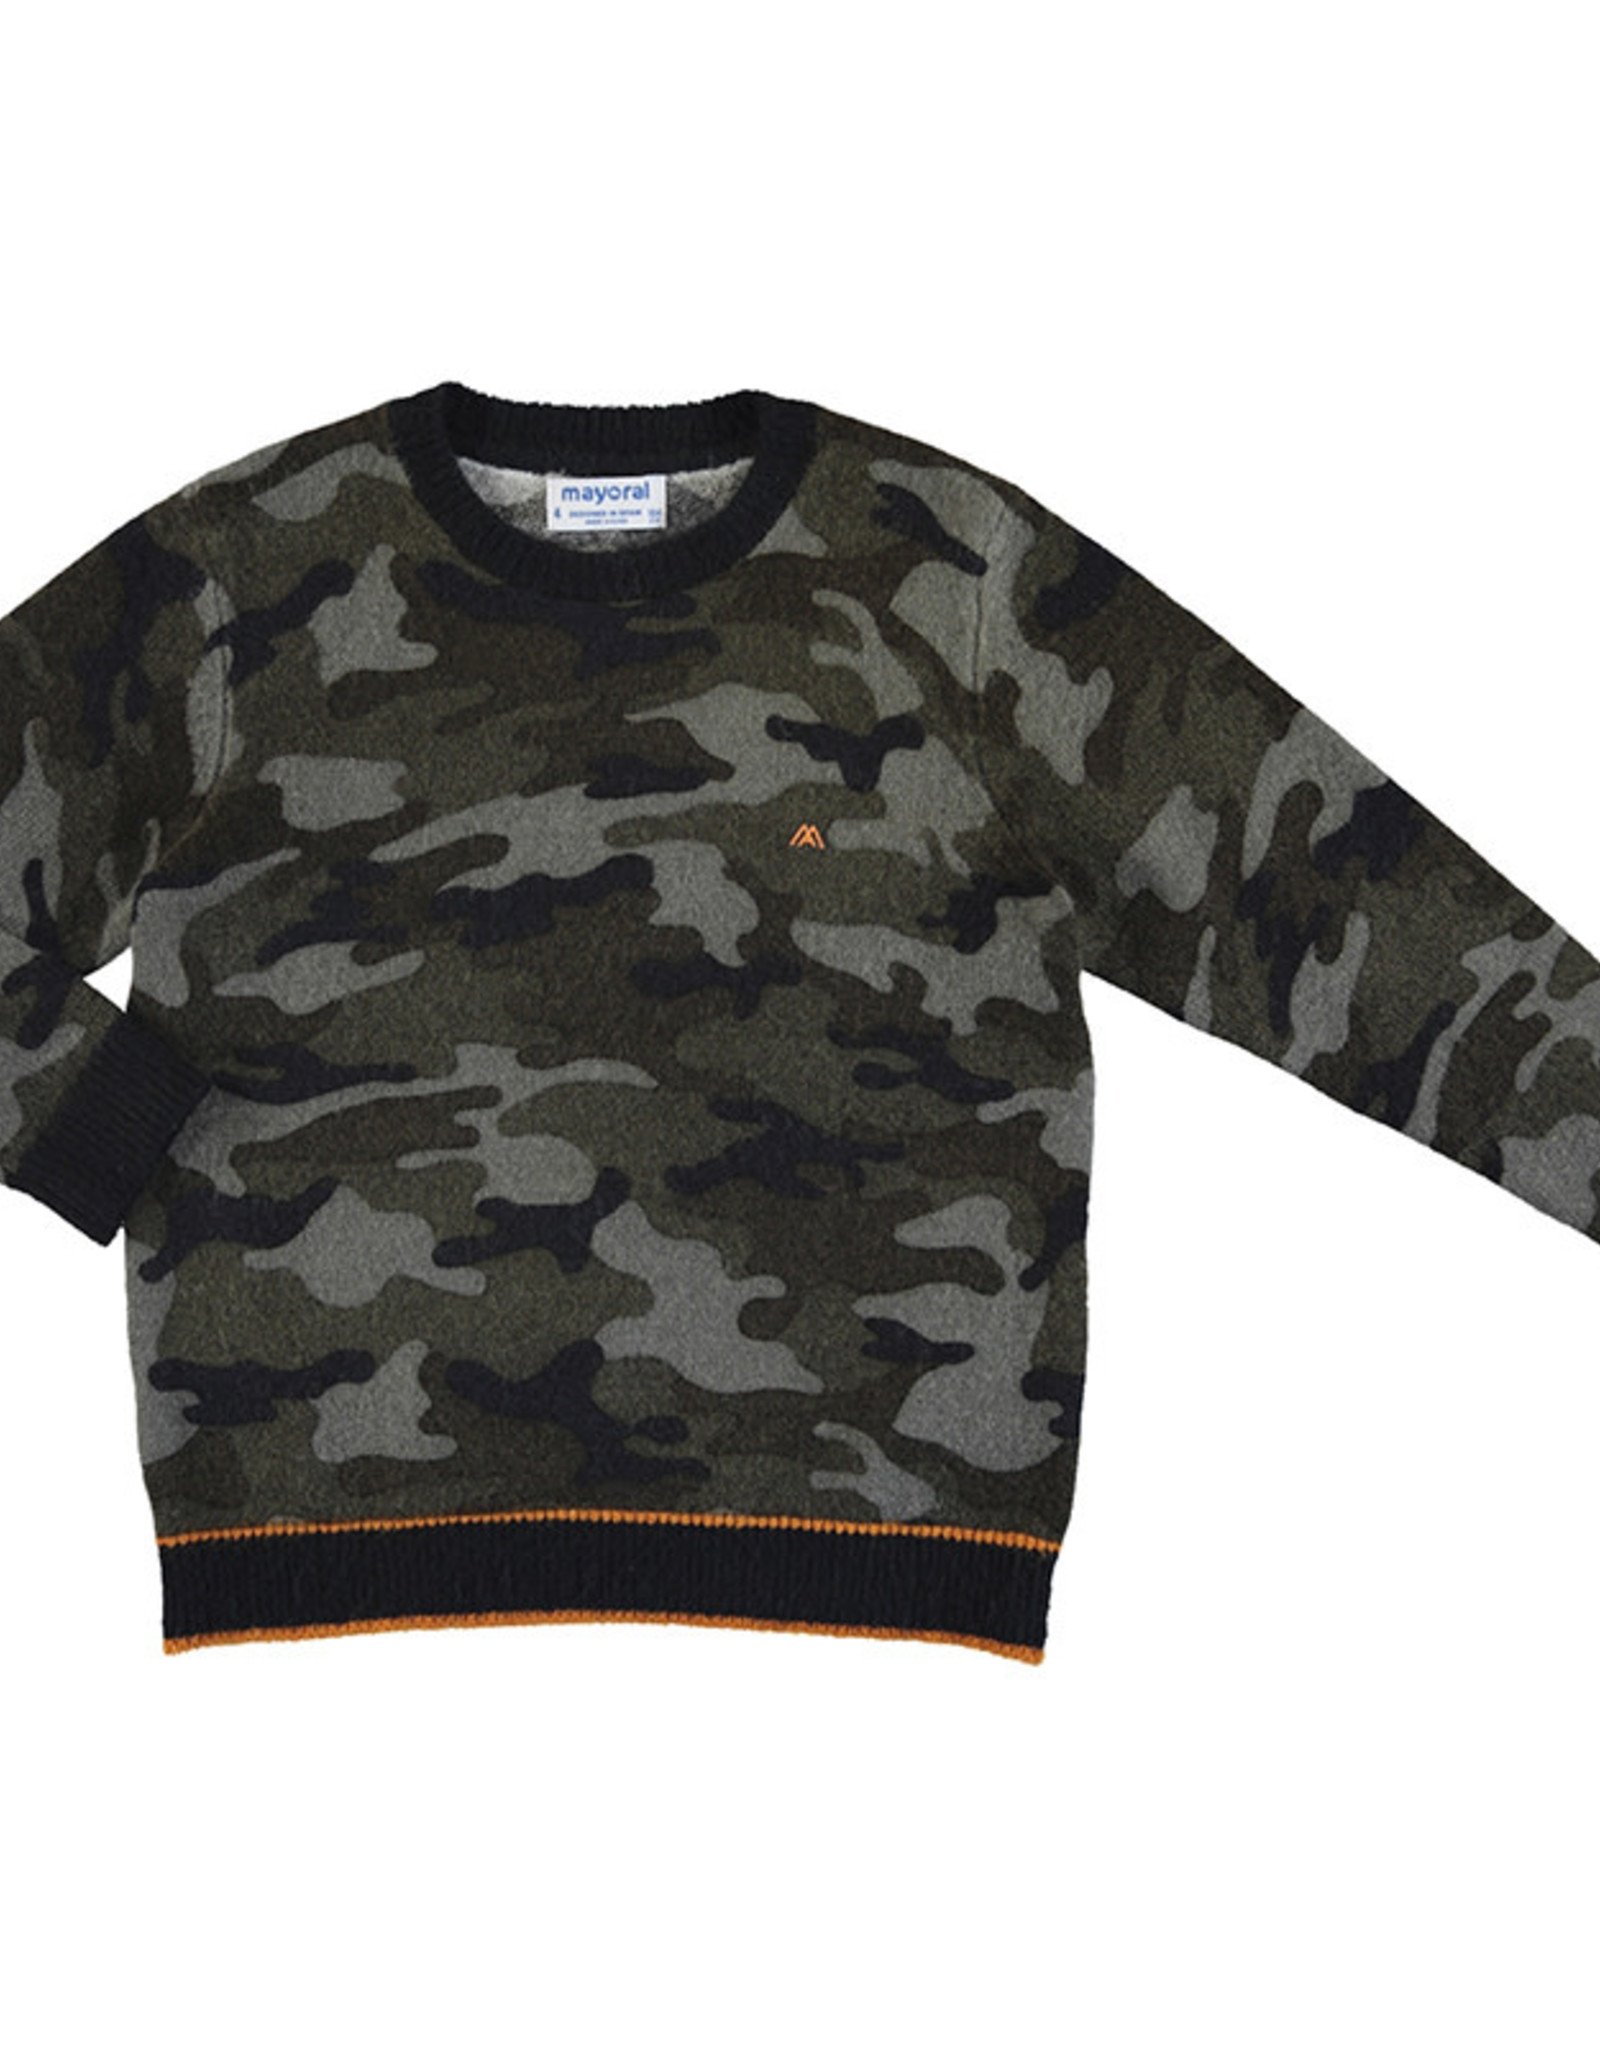 Mayoral Boys Camouflage Sweater with Orange Trim